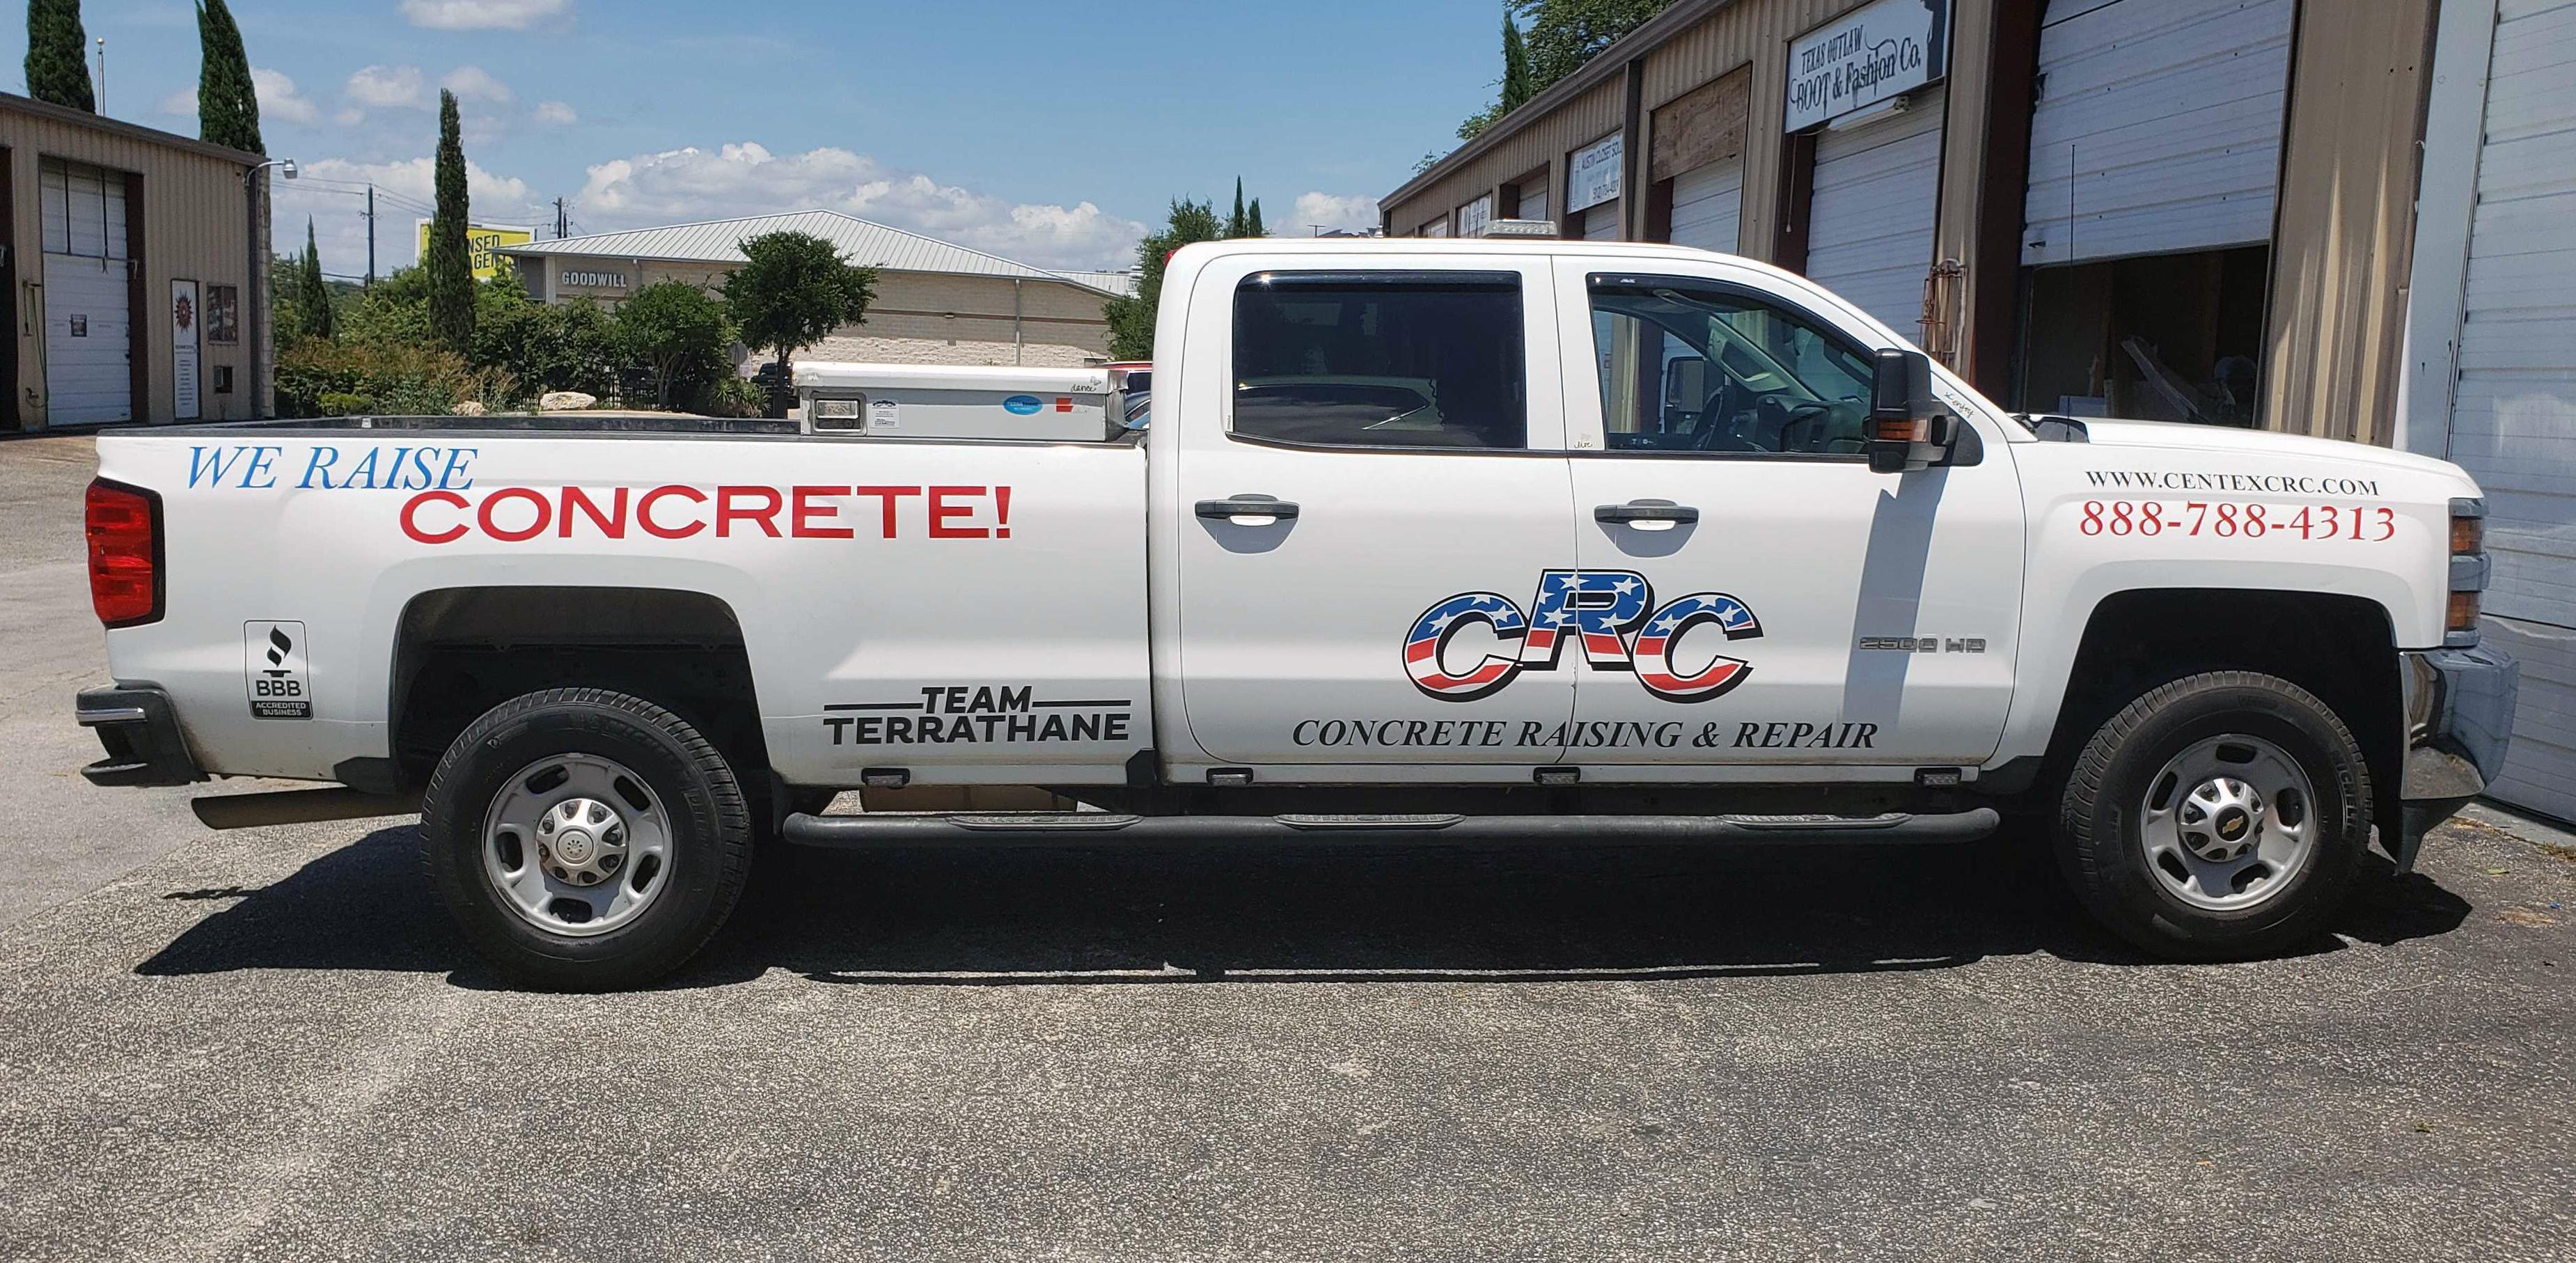 Vehicle Graphics_Austin Texas_inv18690